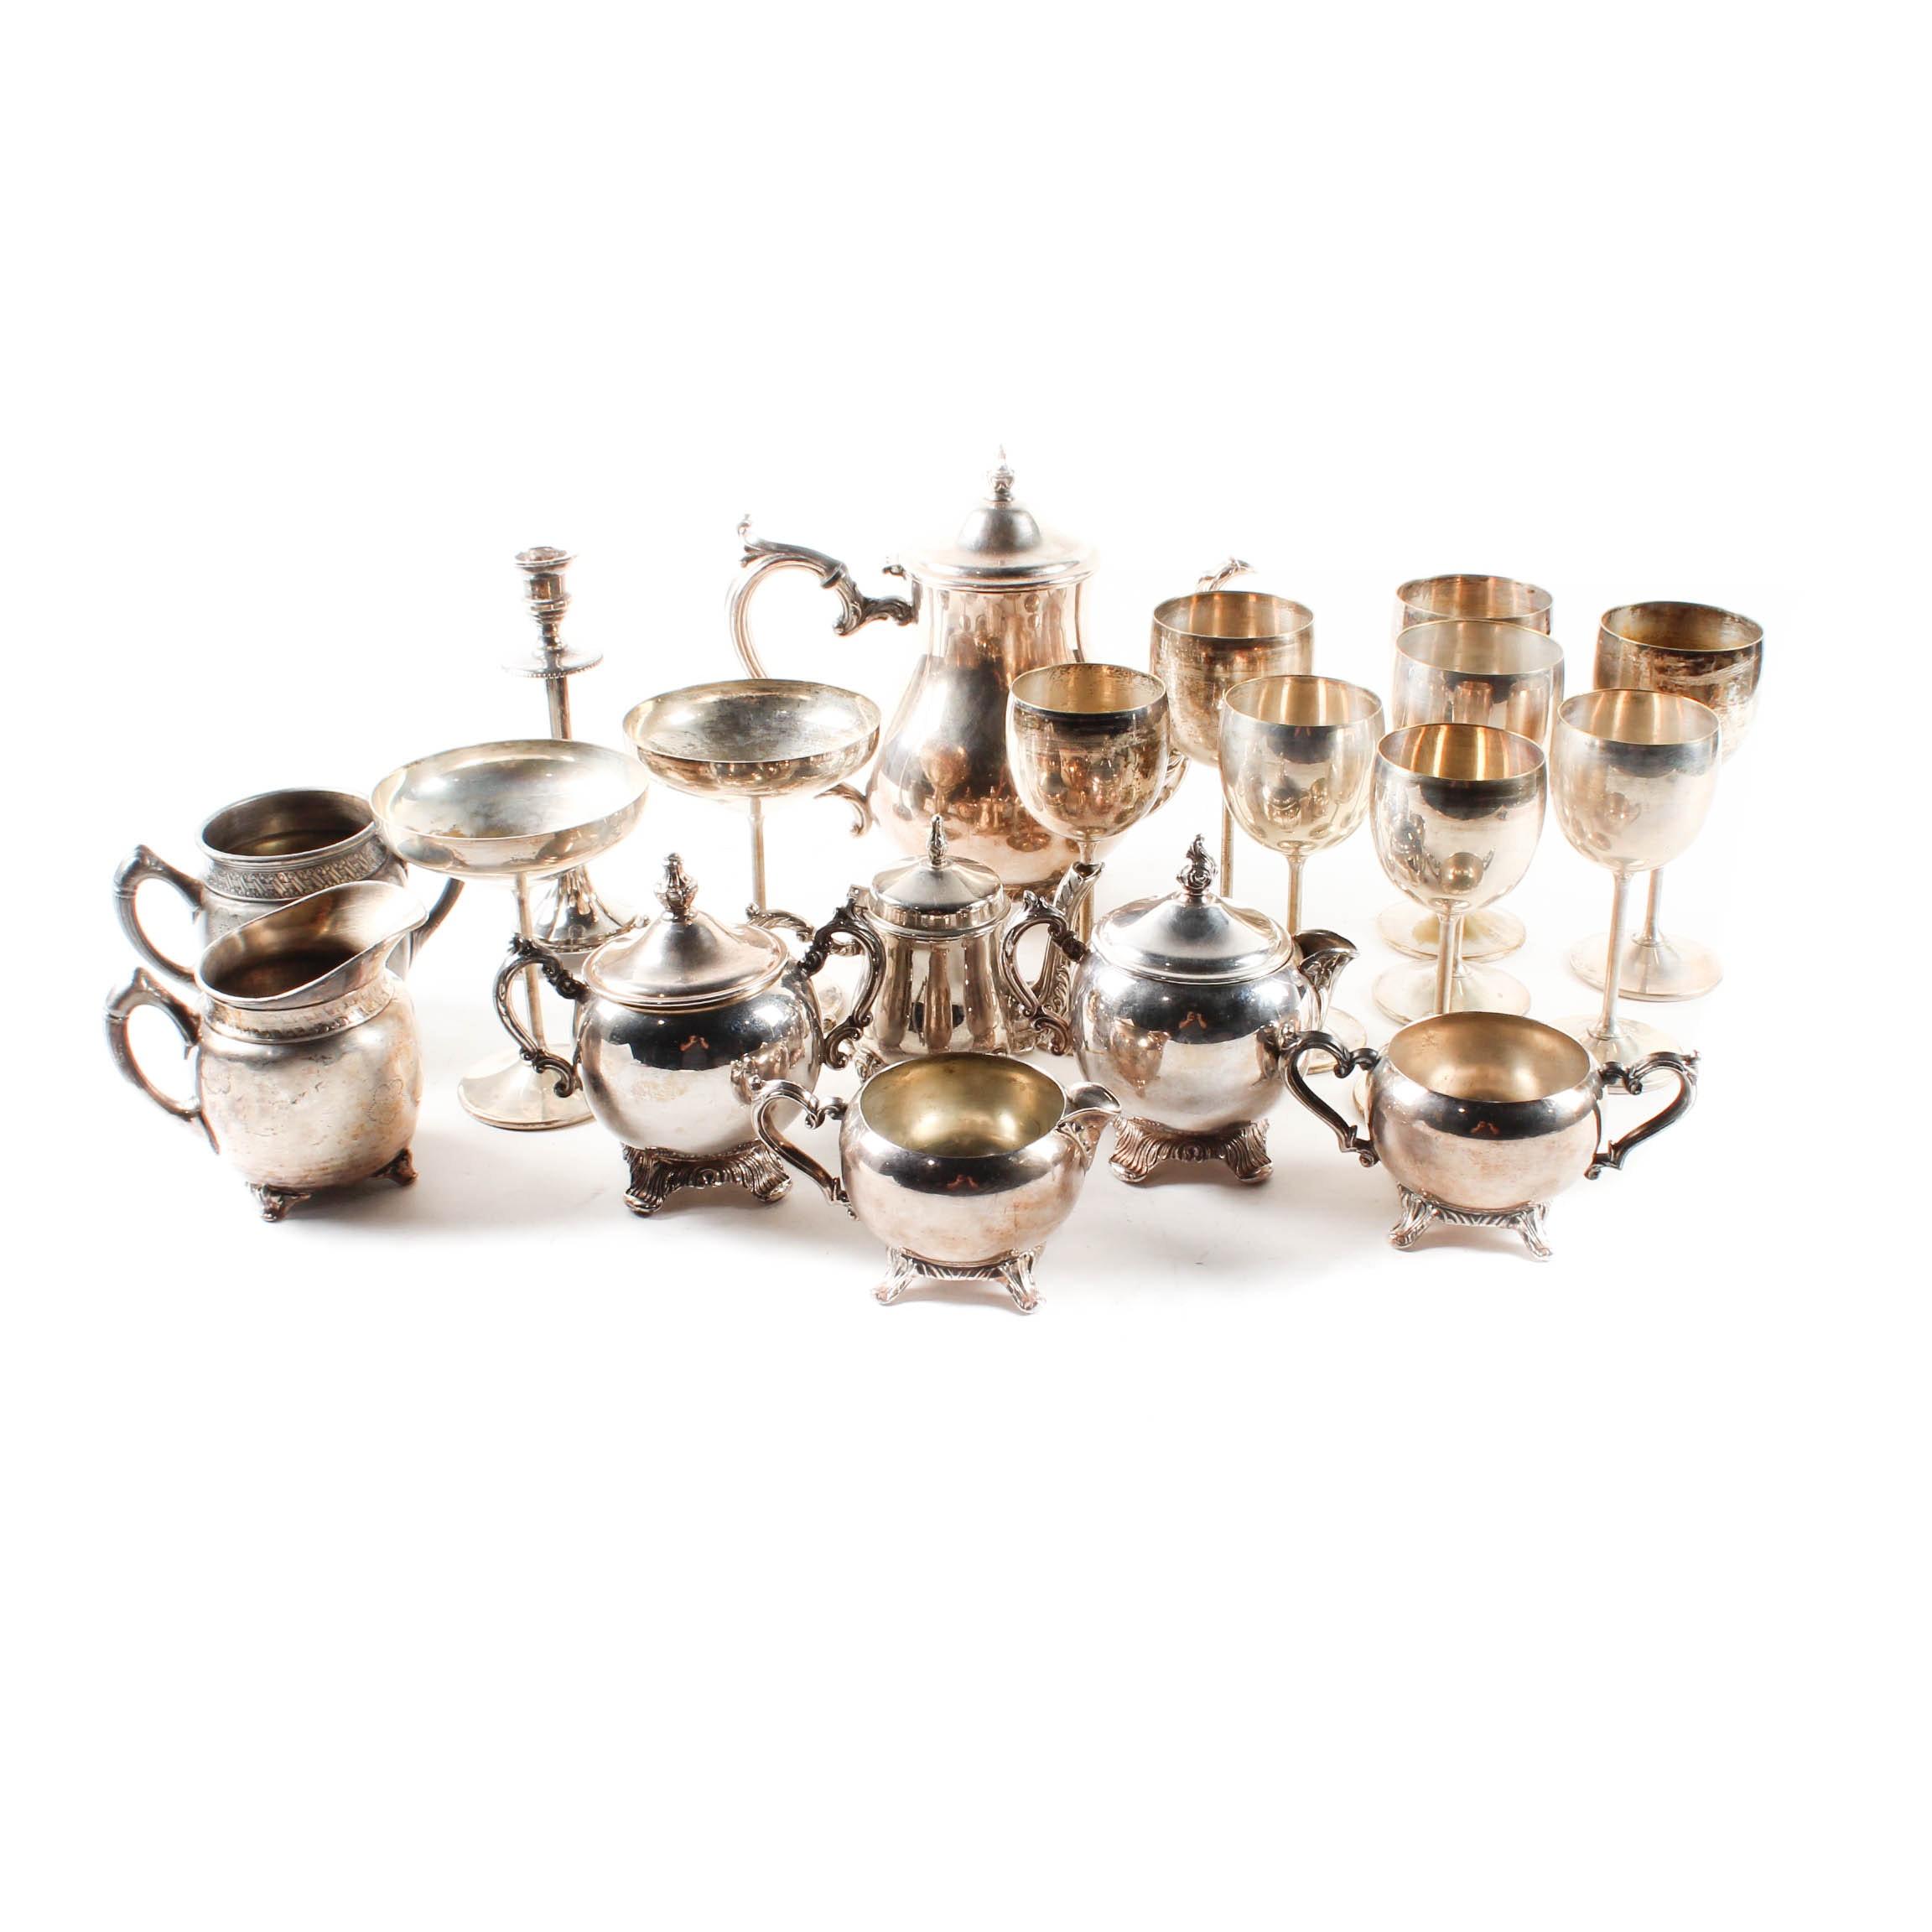 Silver Plate Stemware and Tableware